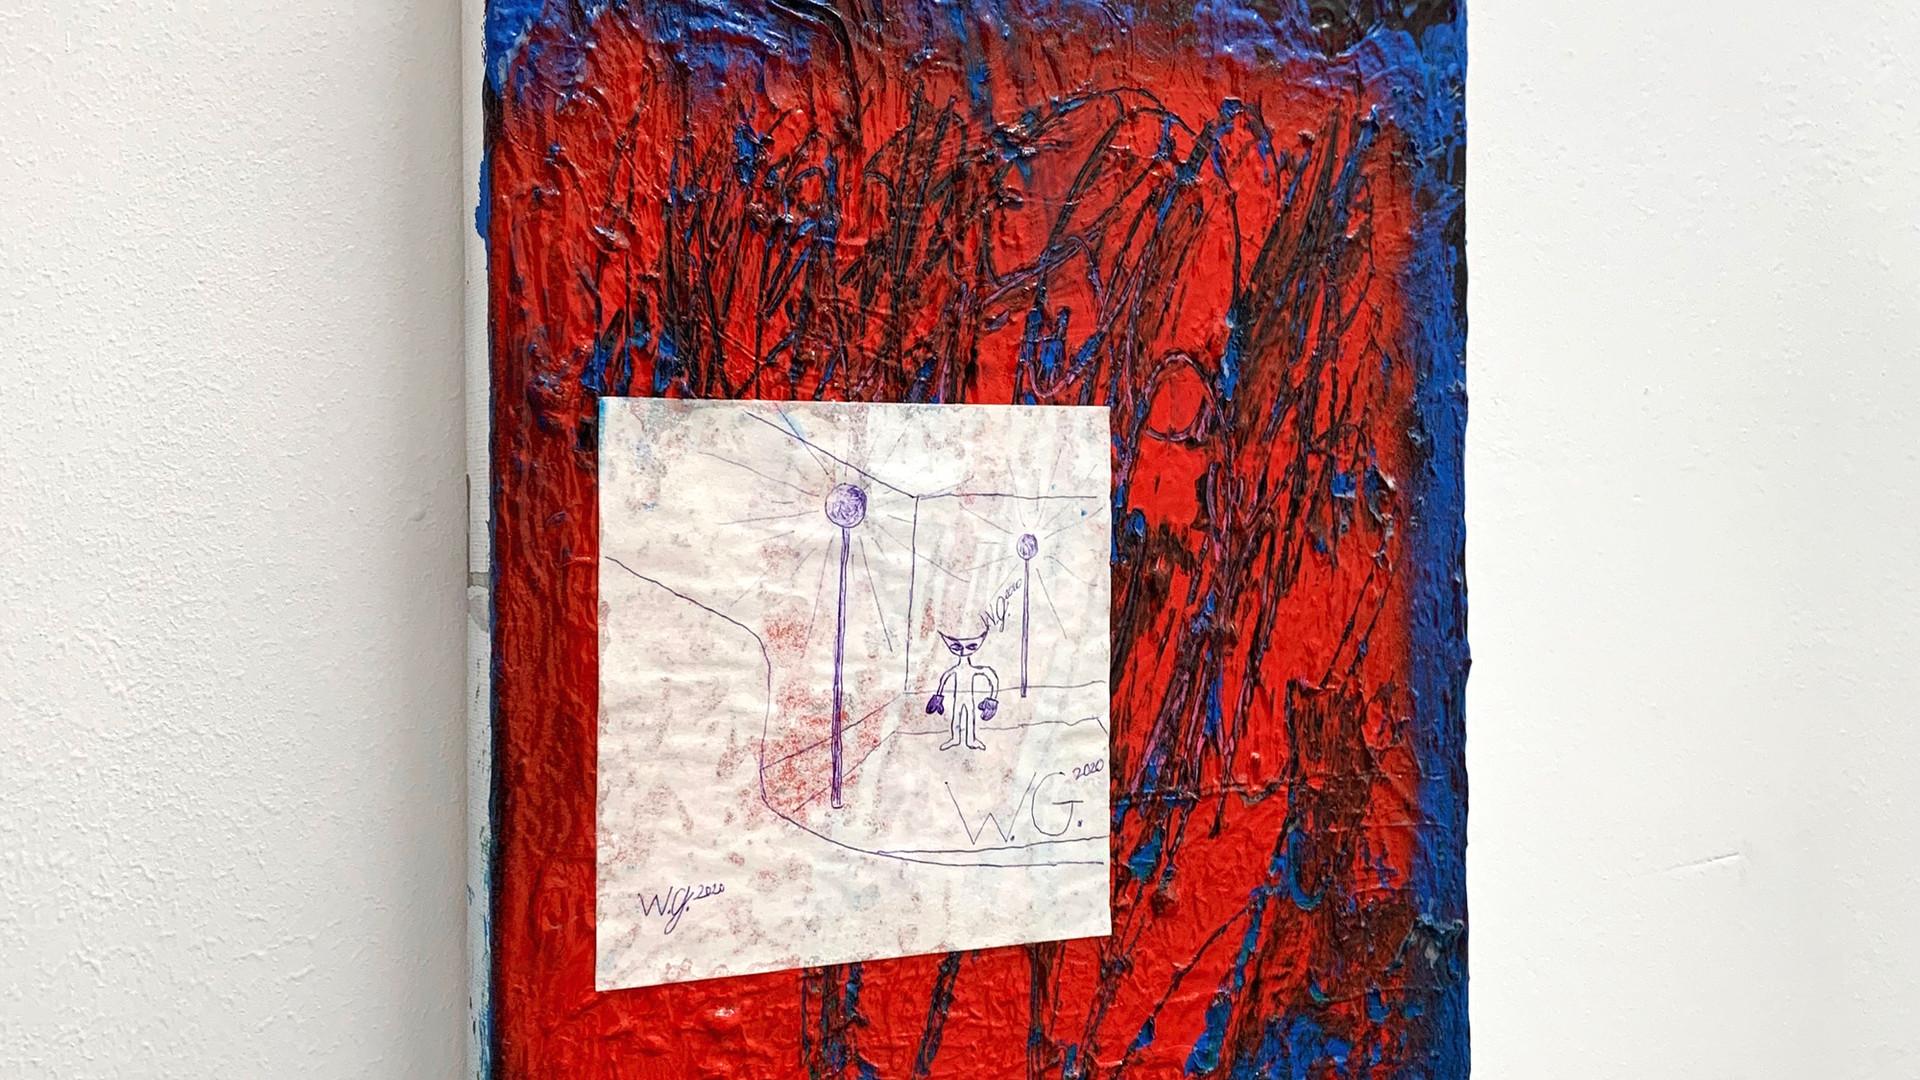 Ohne Titel / 2020 / 40x30cm / Acryl, Collage, Lack auf Leinwand   --  Wolfgang Günther / Emde Gallery / Soloshow / Mainz, 2020